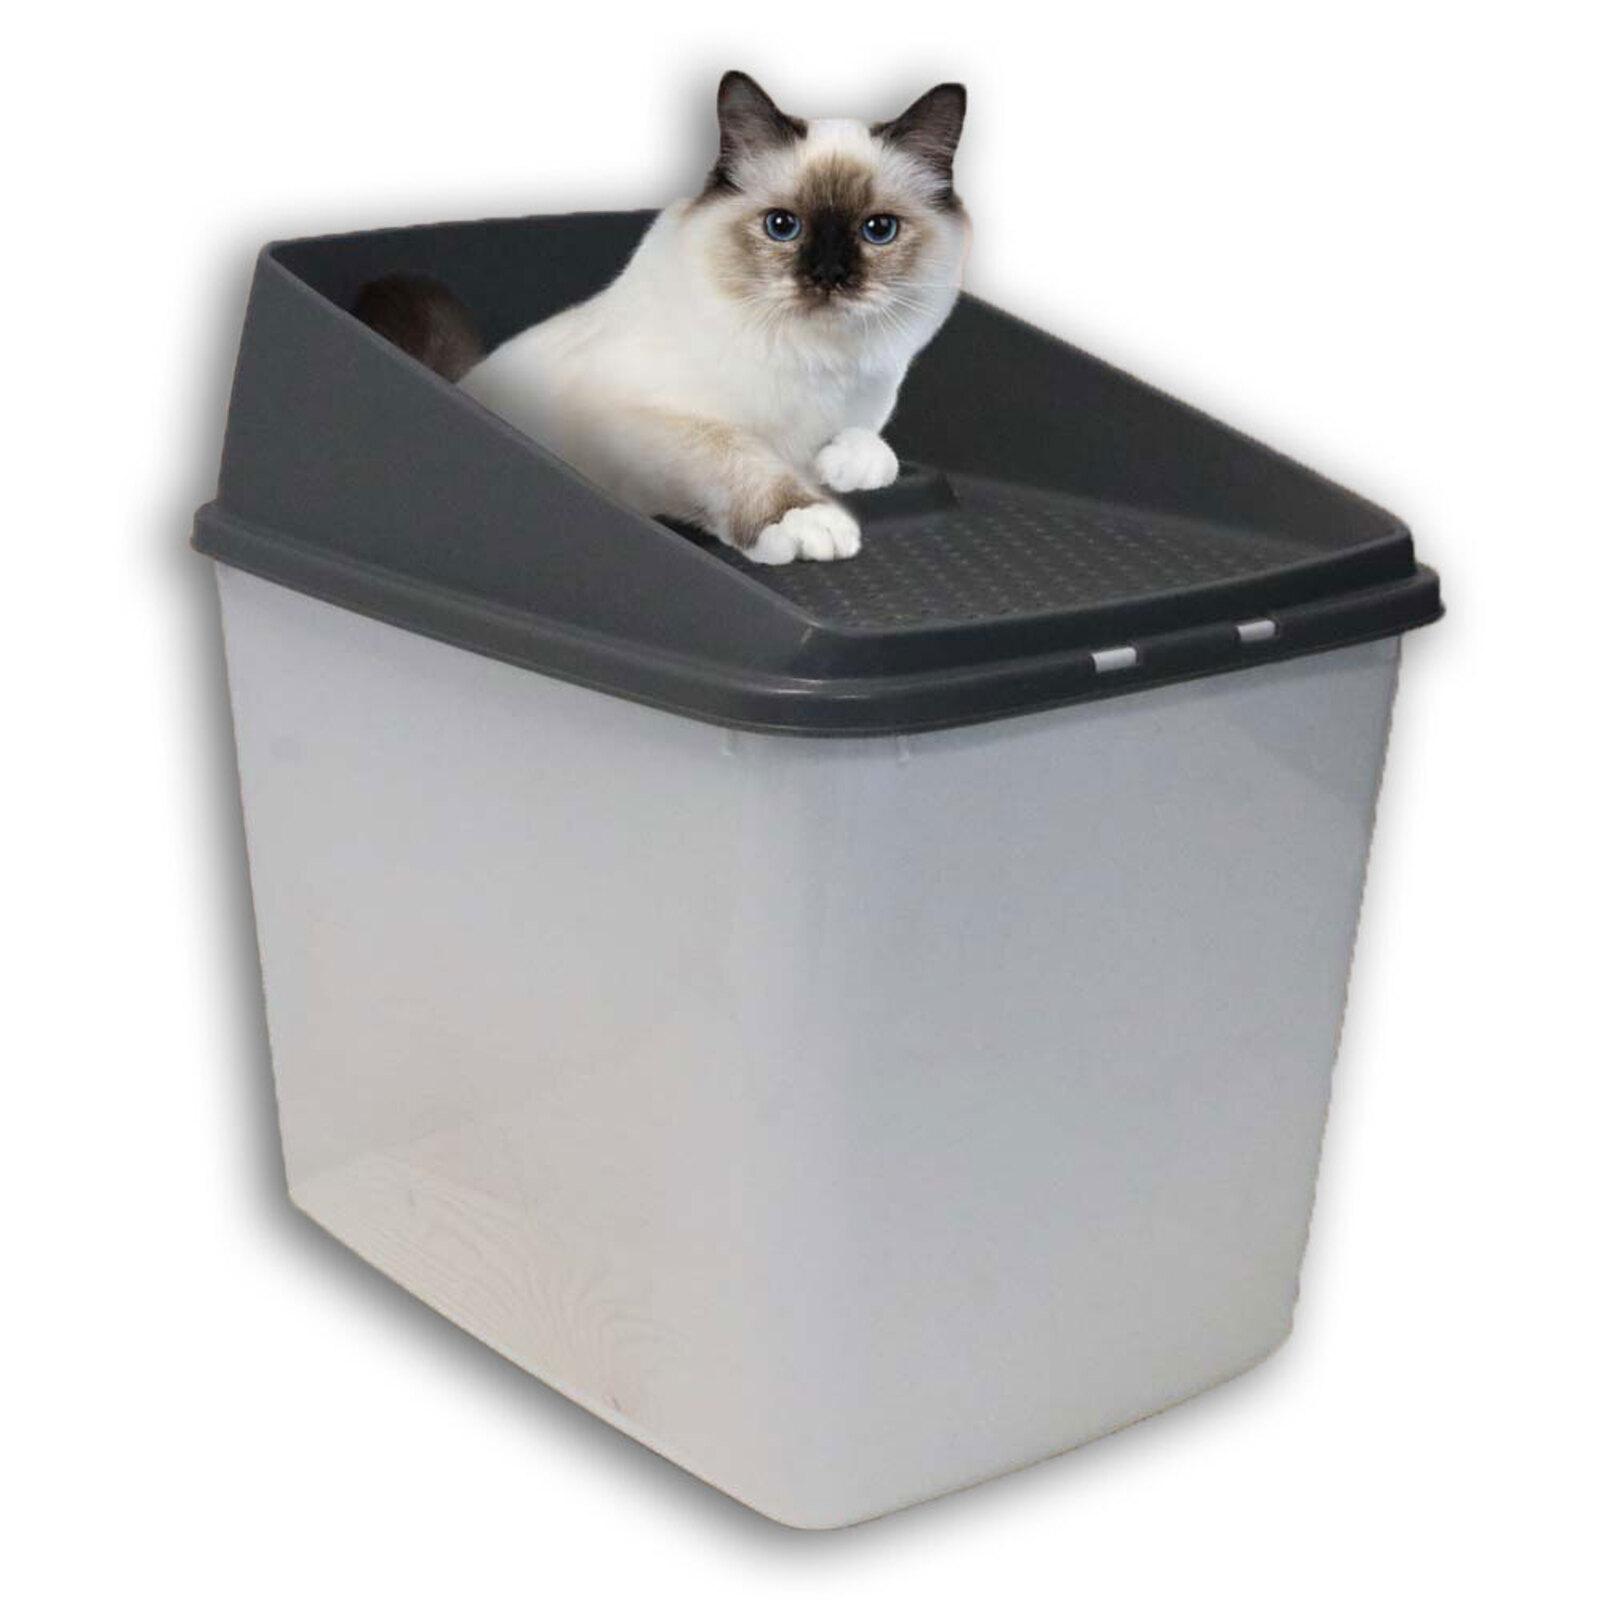 Paws & Claws Hide Away Pet/Kitten/Cat Litter Box w/ Built In Filtering Grate Lid